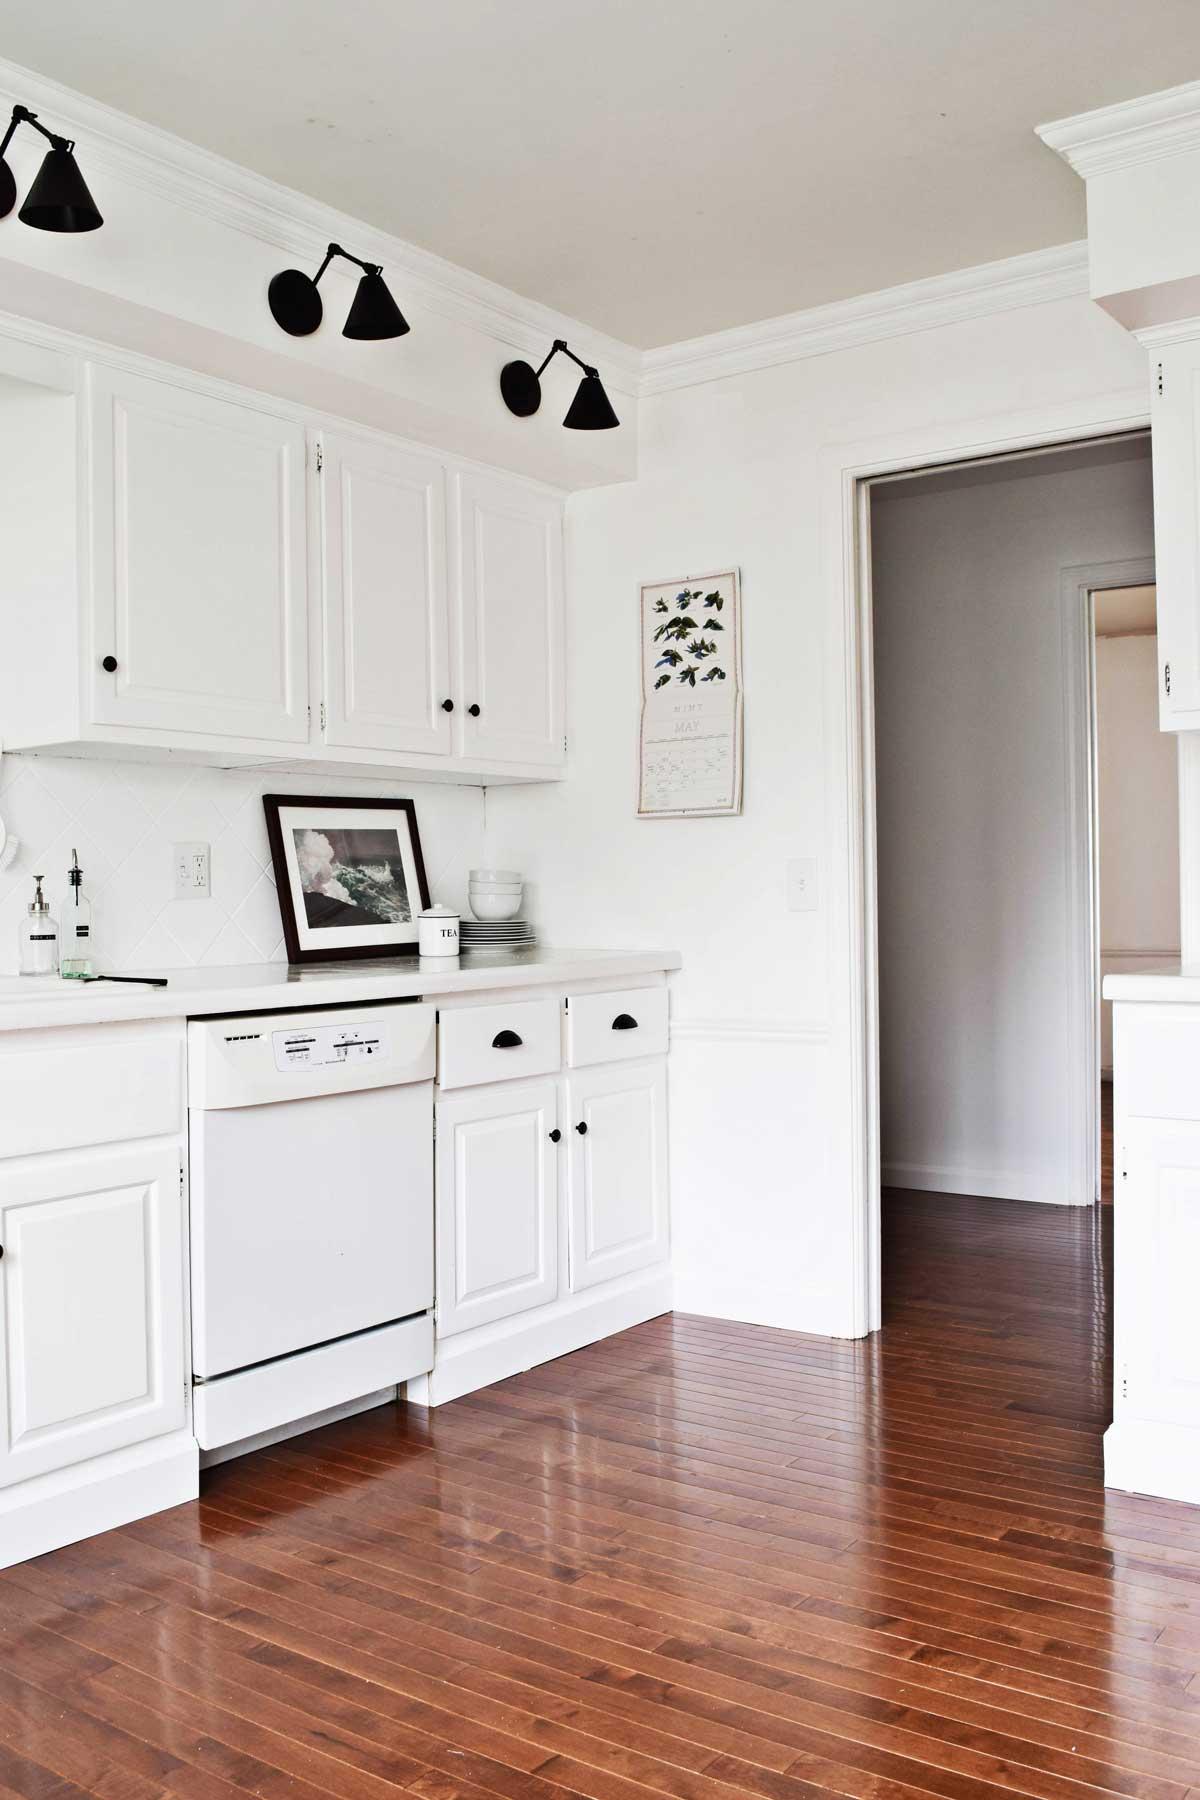 Rachel Schultz Building Out The Toe Kicks On Kitchen Cabinets